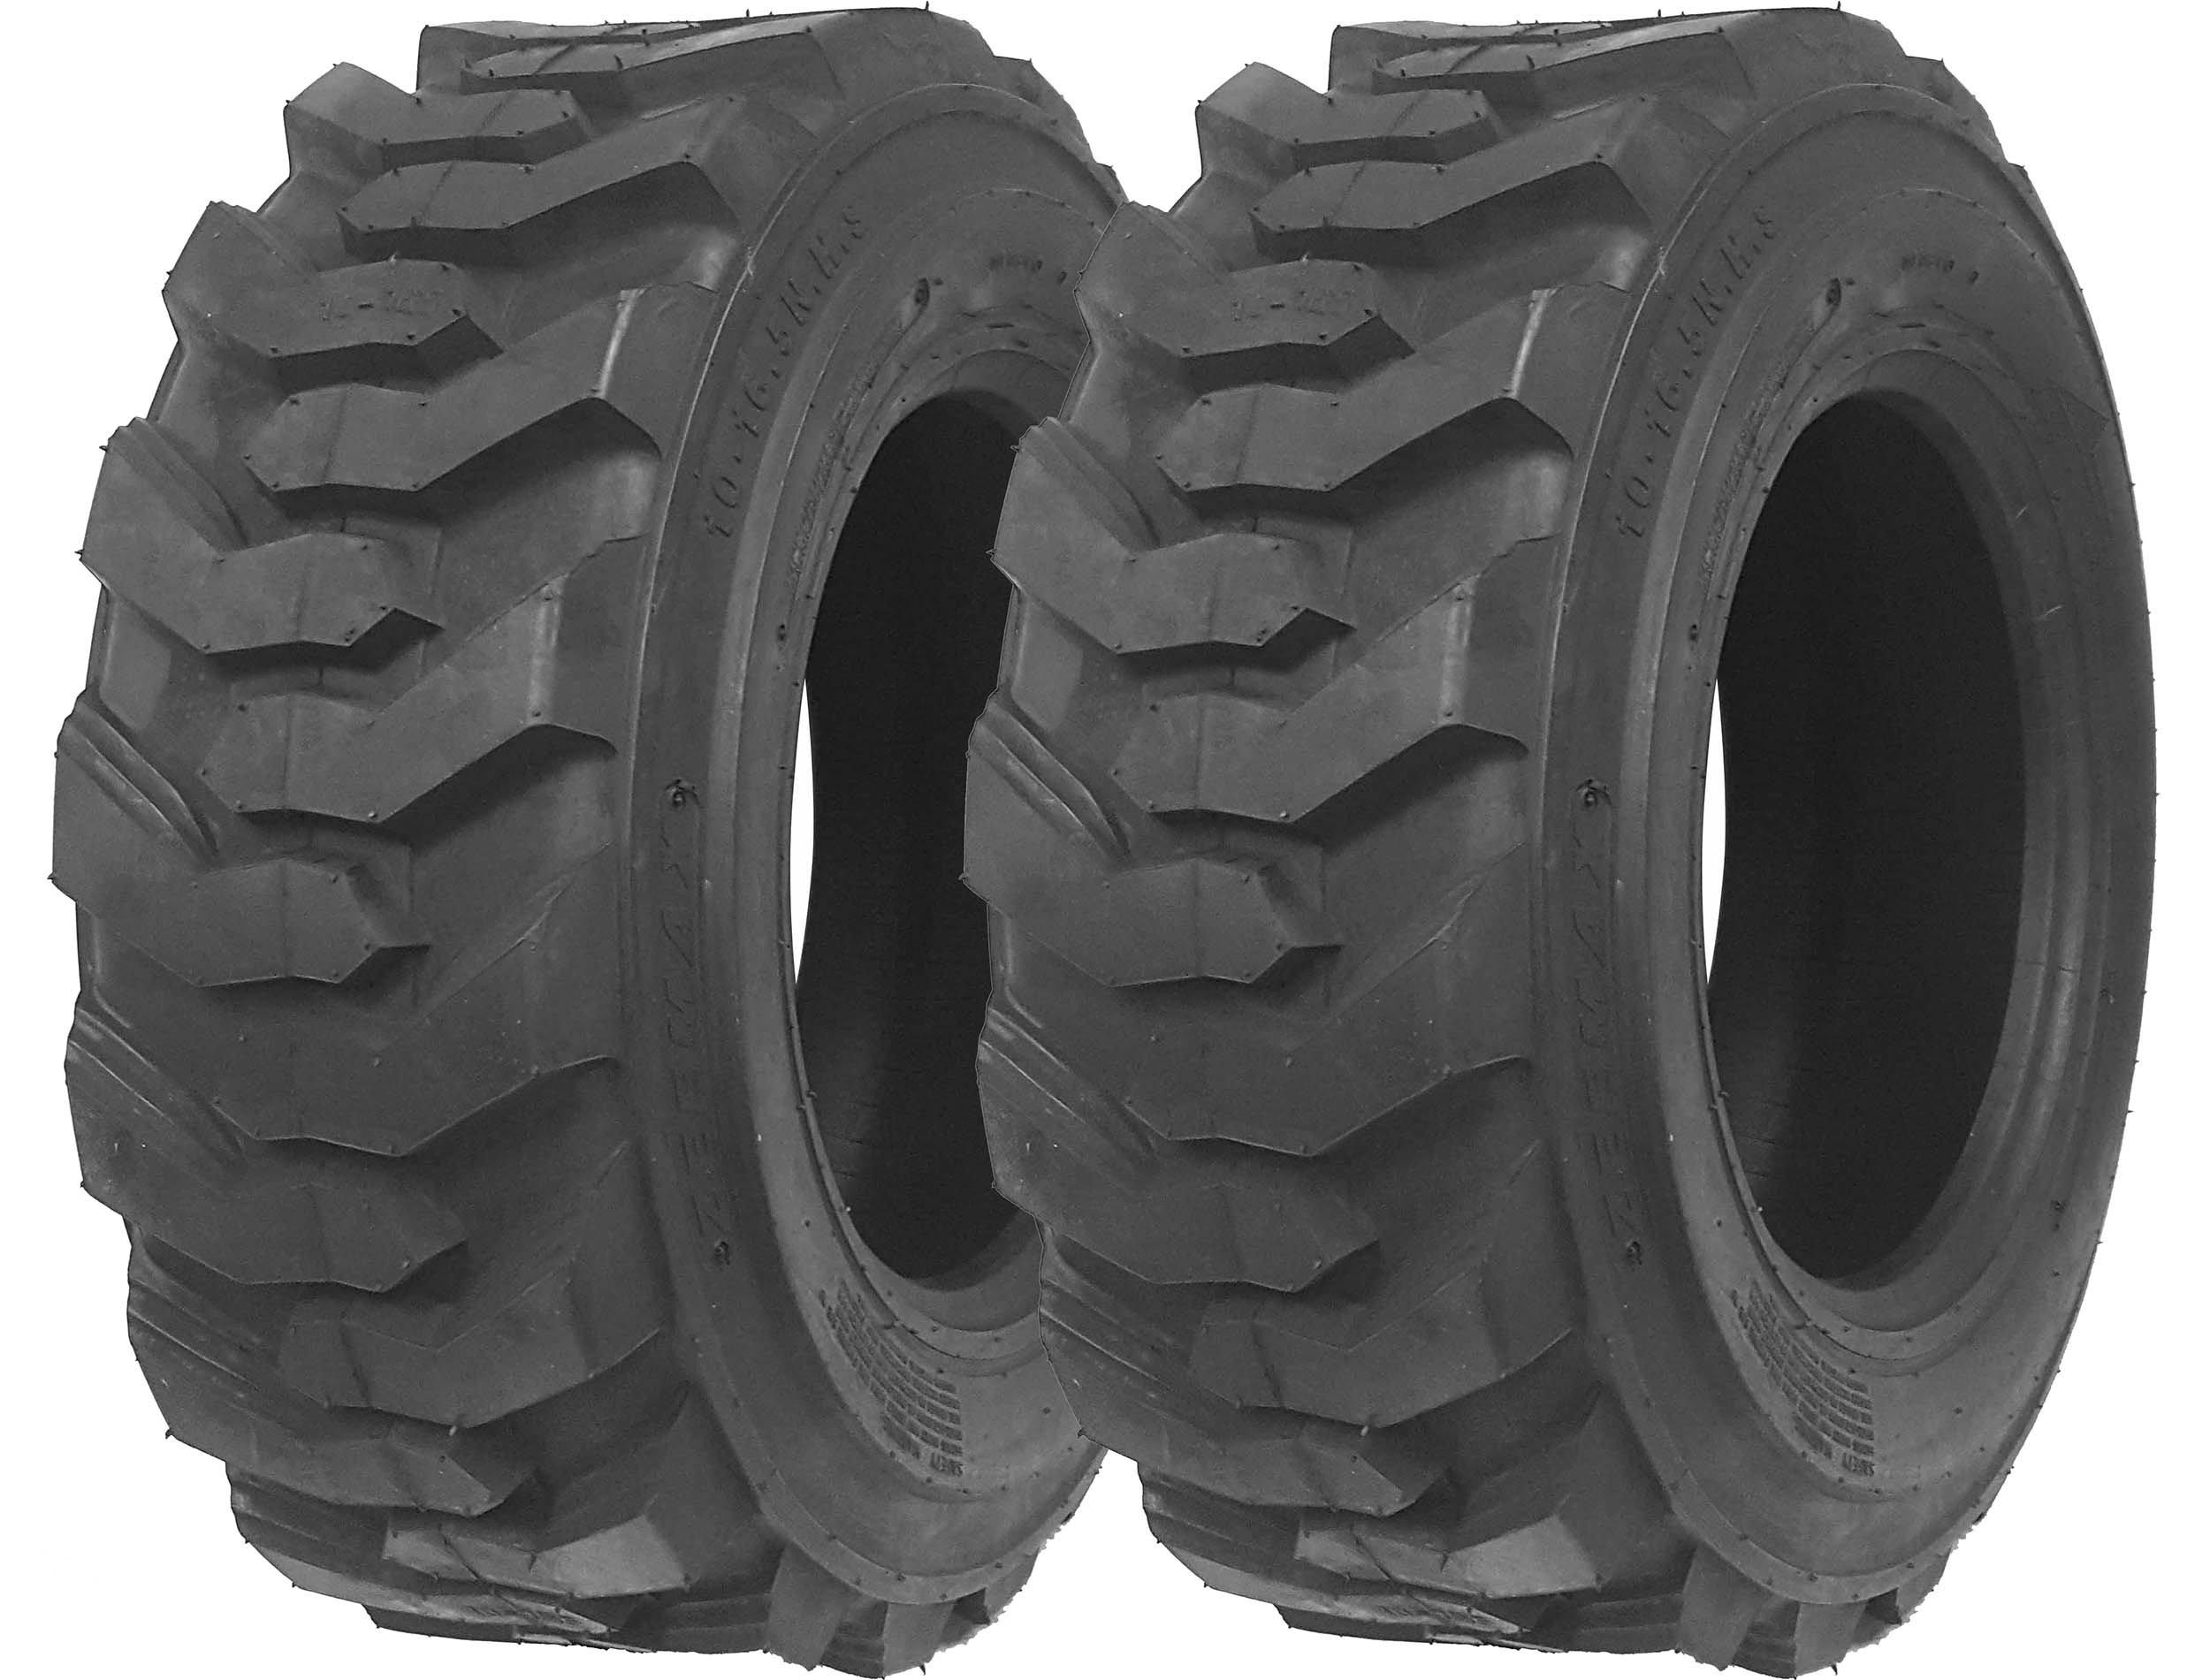 Set of 2 New ZEEMAX Heavy Duty 12-16.5/12PR G2 Skid Steer Tires for Bobcat w/ Rim Guard